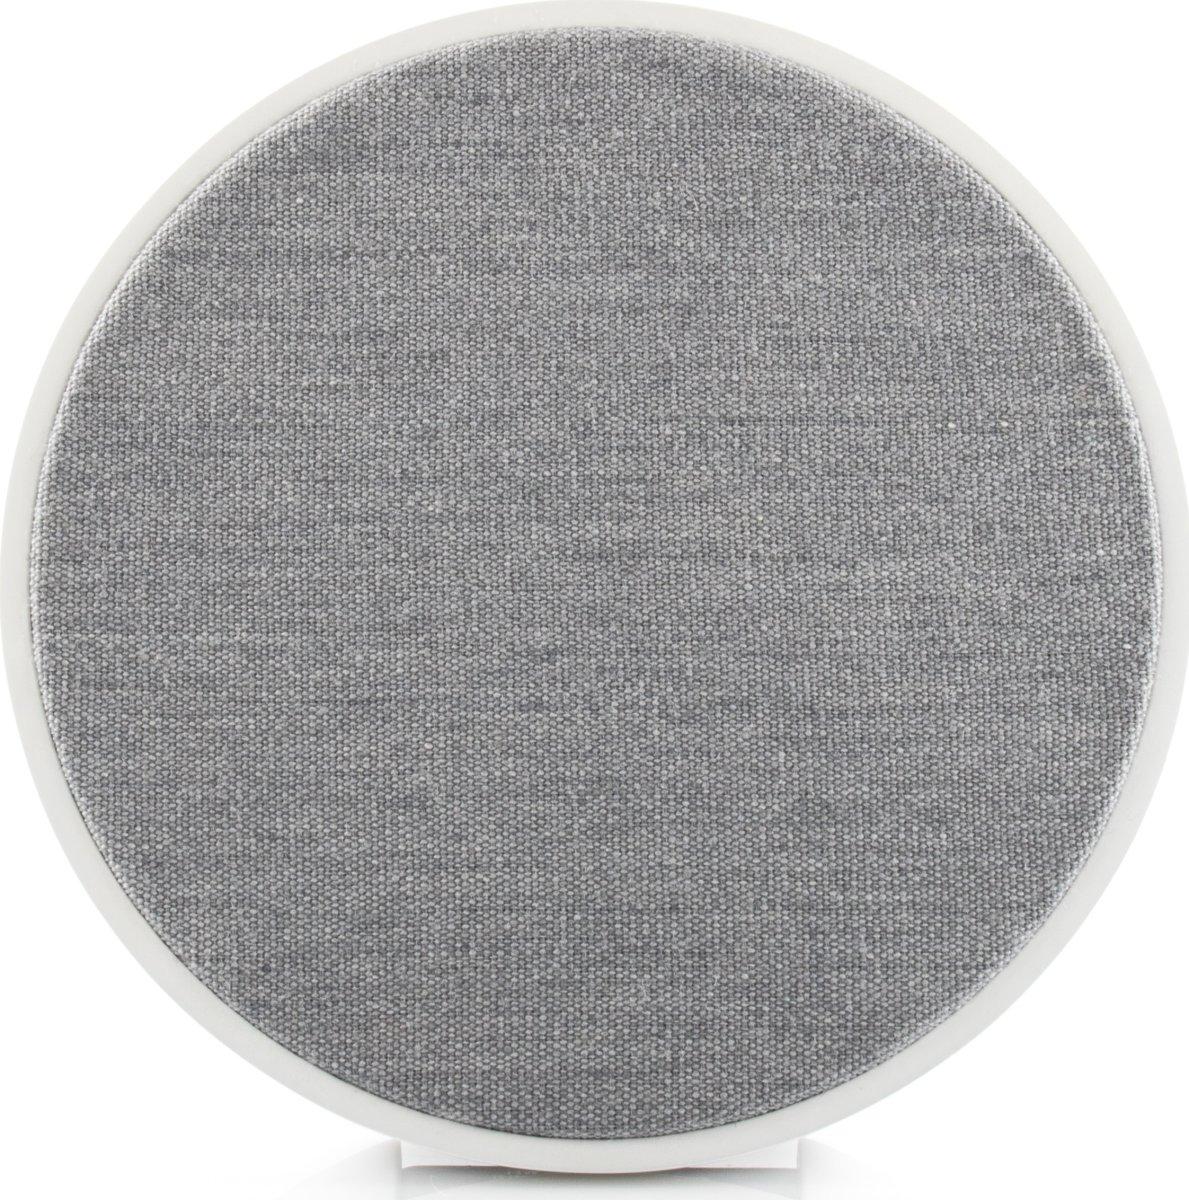 Tivoli Audio ORB transportabel højttaler, hvid